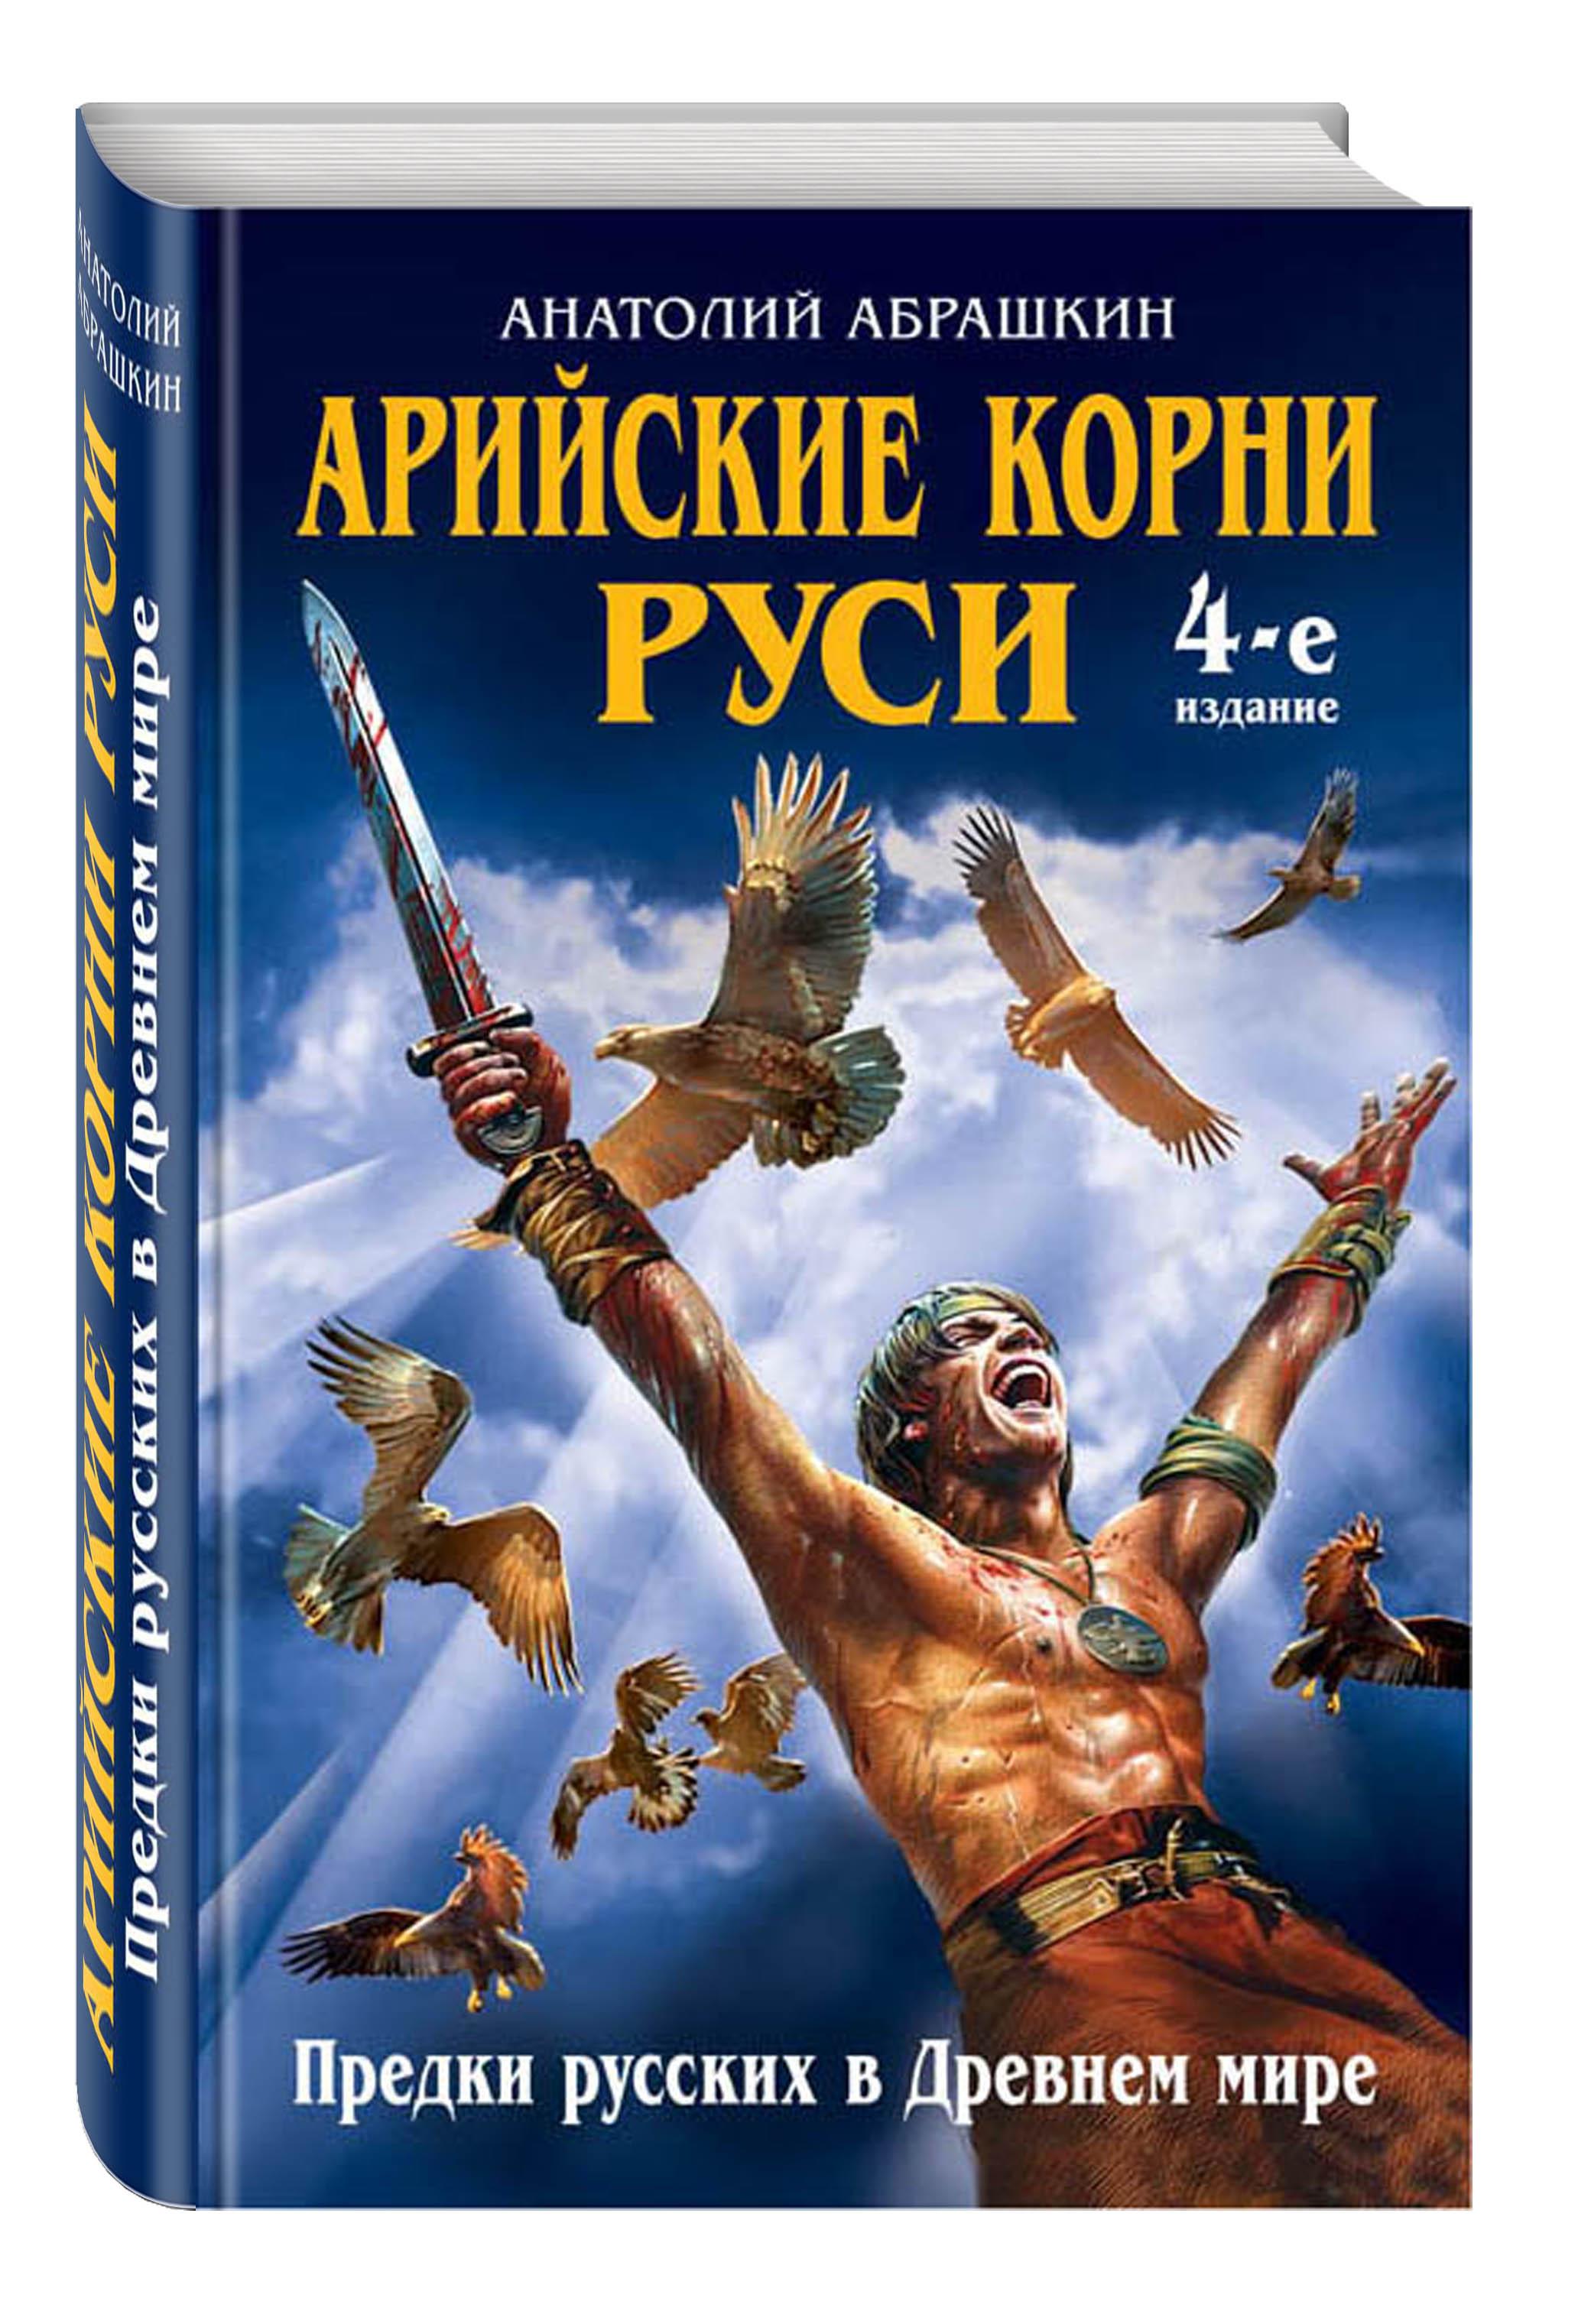 Арийские корни Руси. Предки русских в Древнем мире. 4-е издание